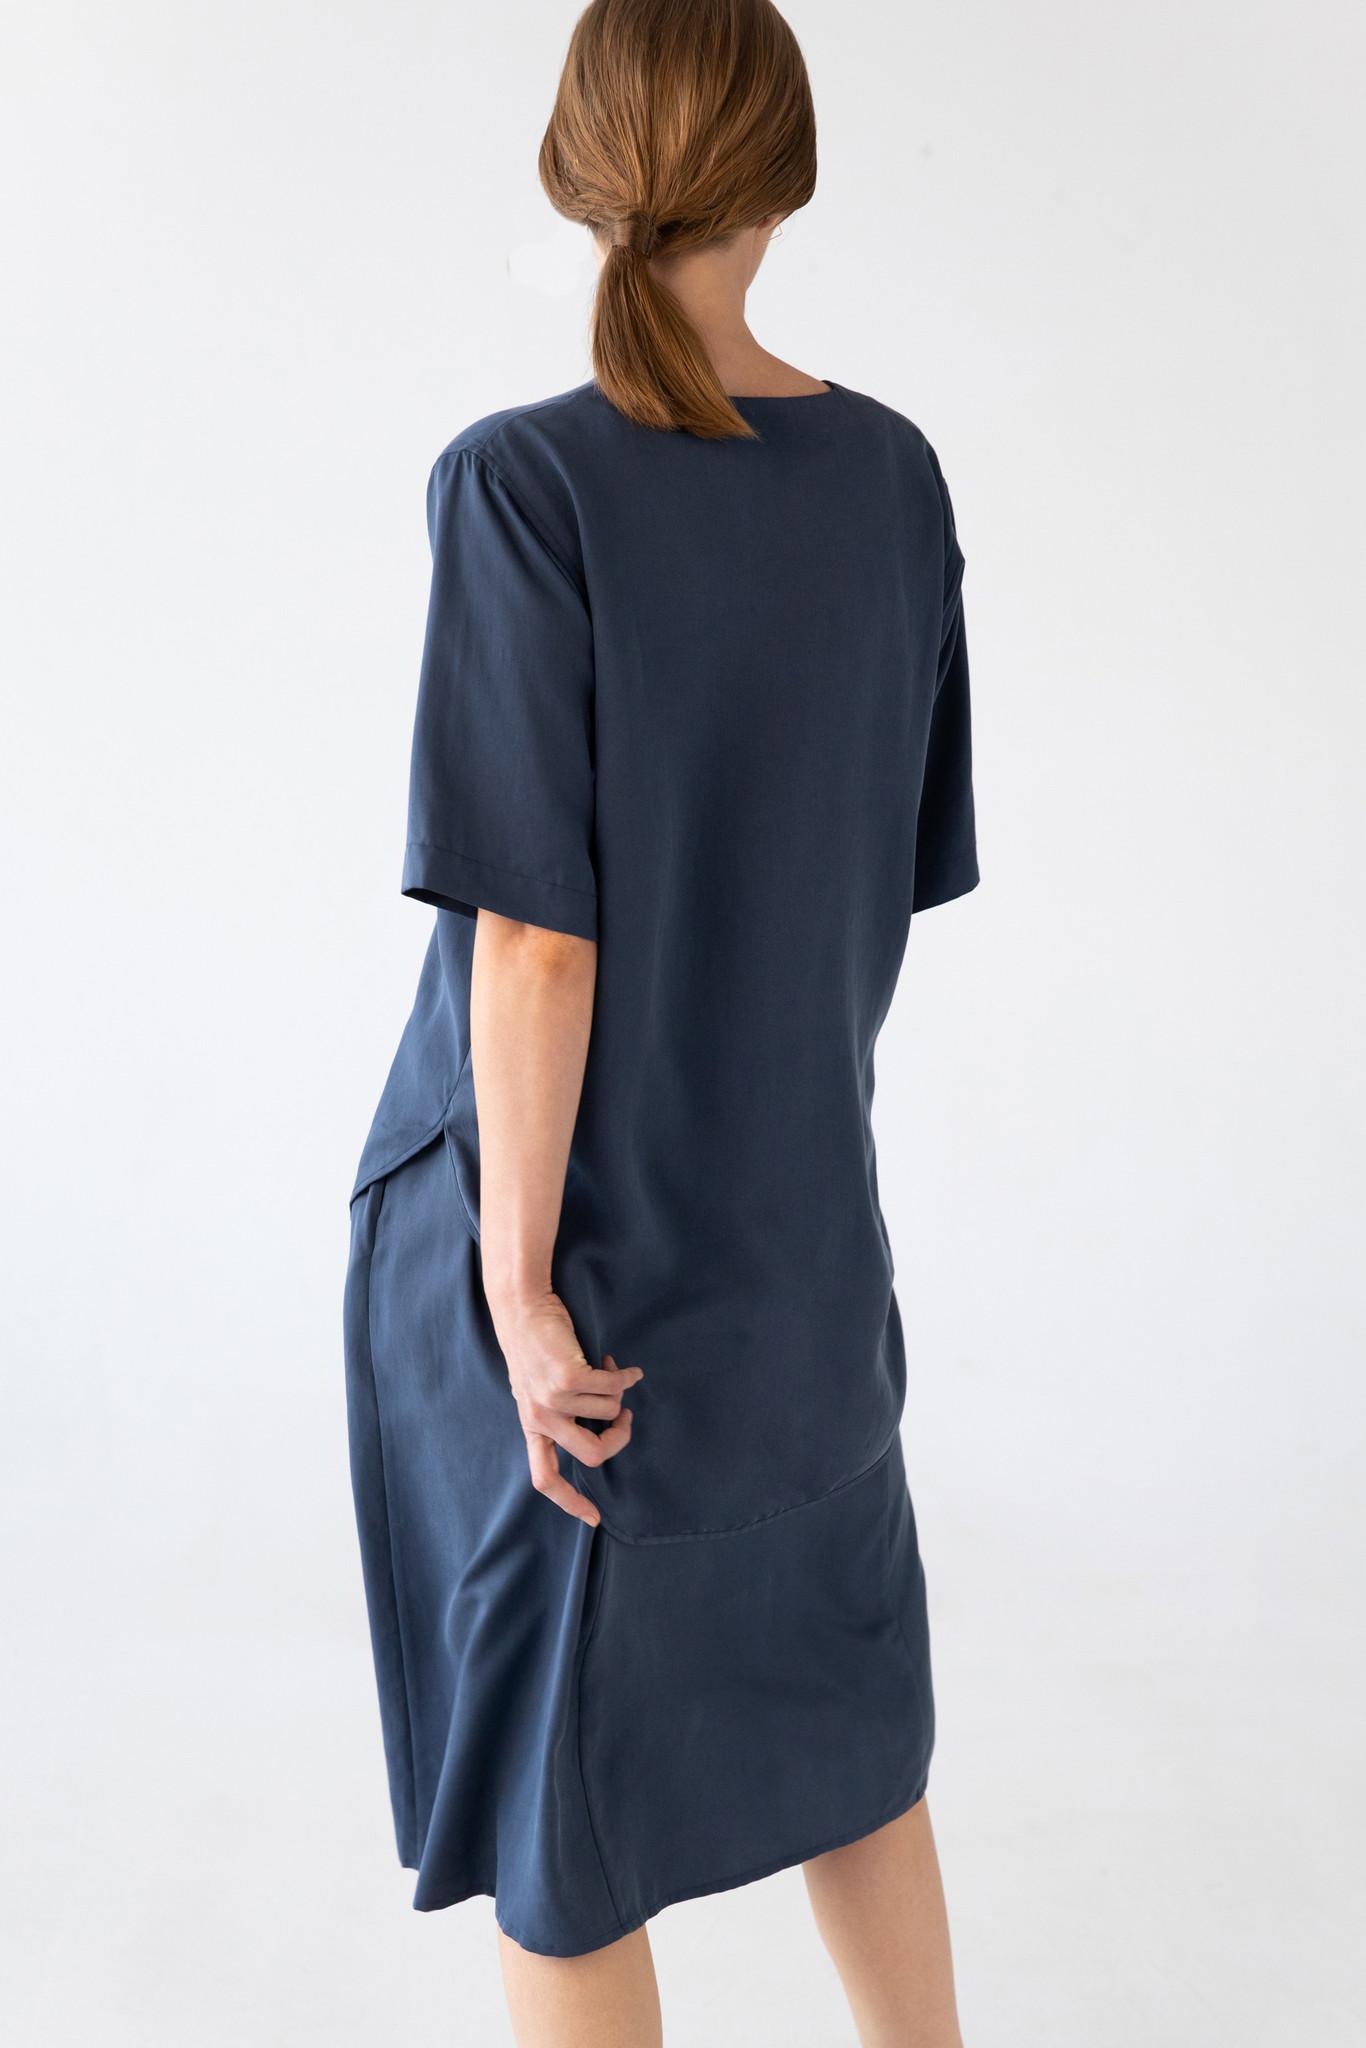 Bluse mit kurzem Arm aus Tencel - Blau-5